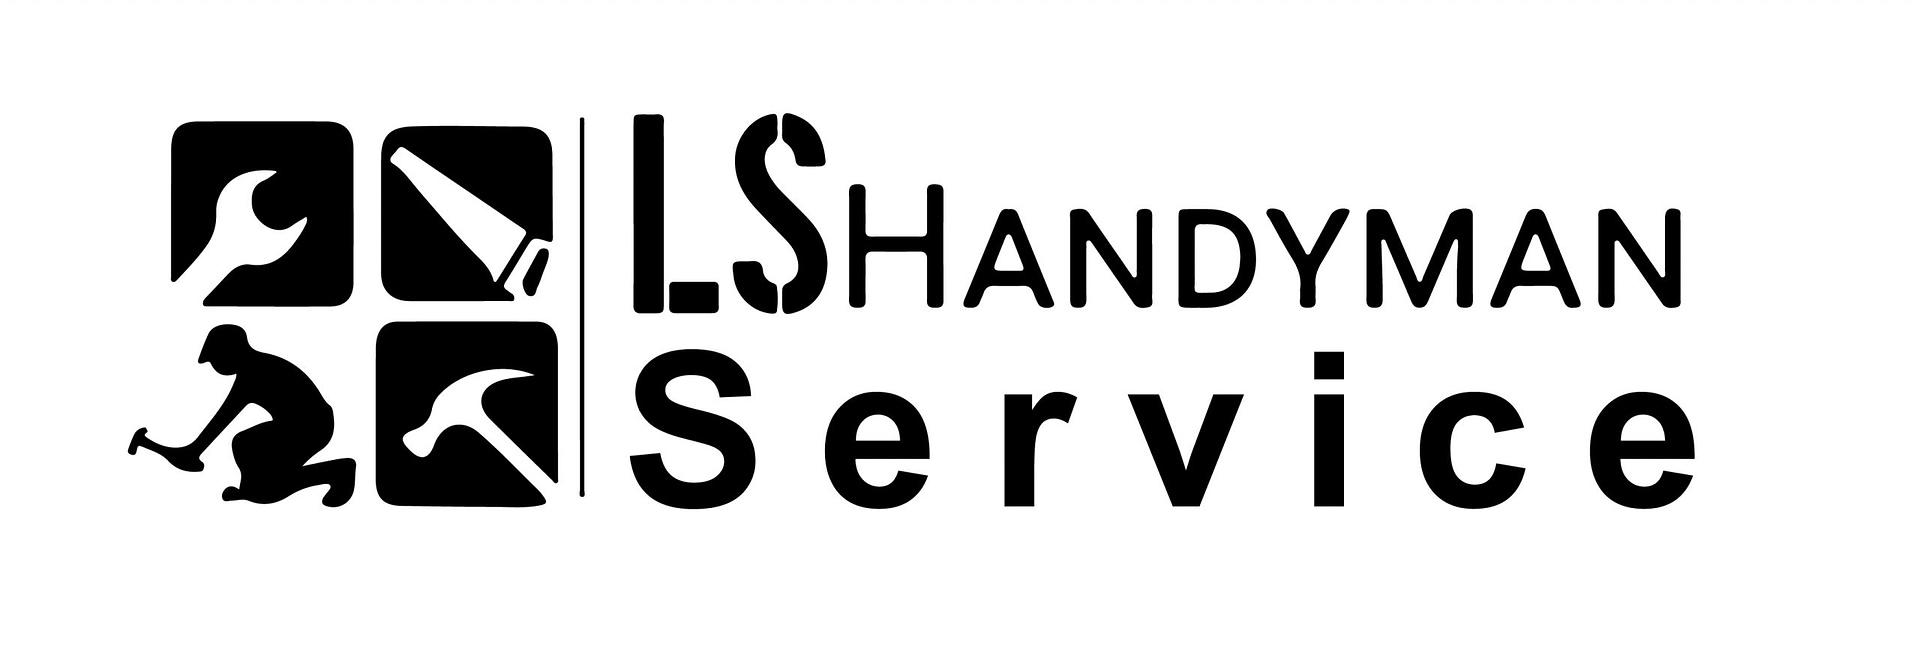 LS Handyman Singapore